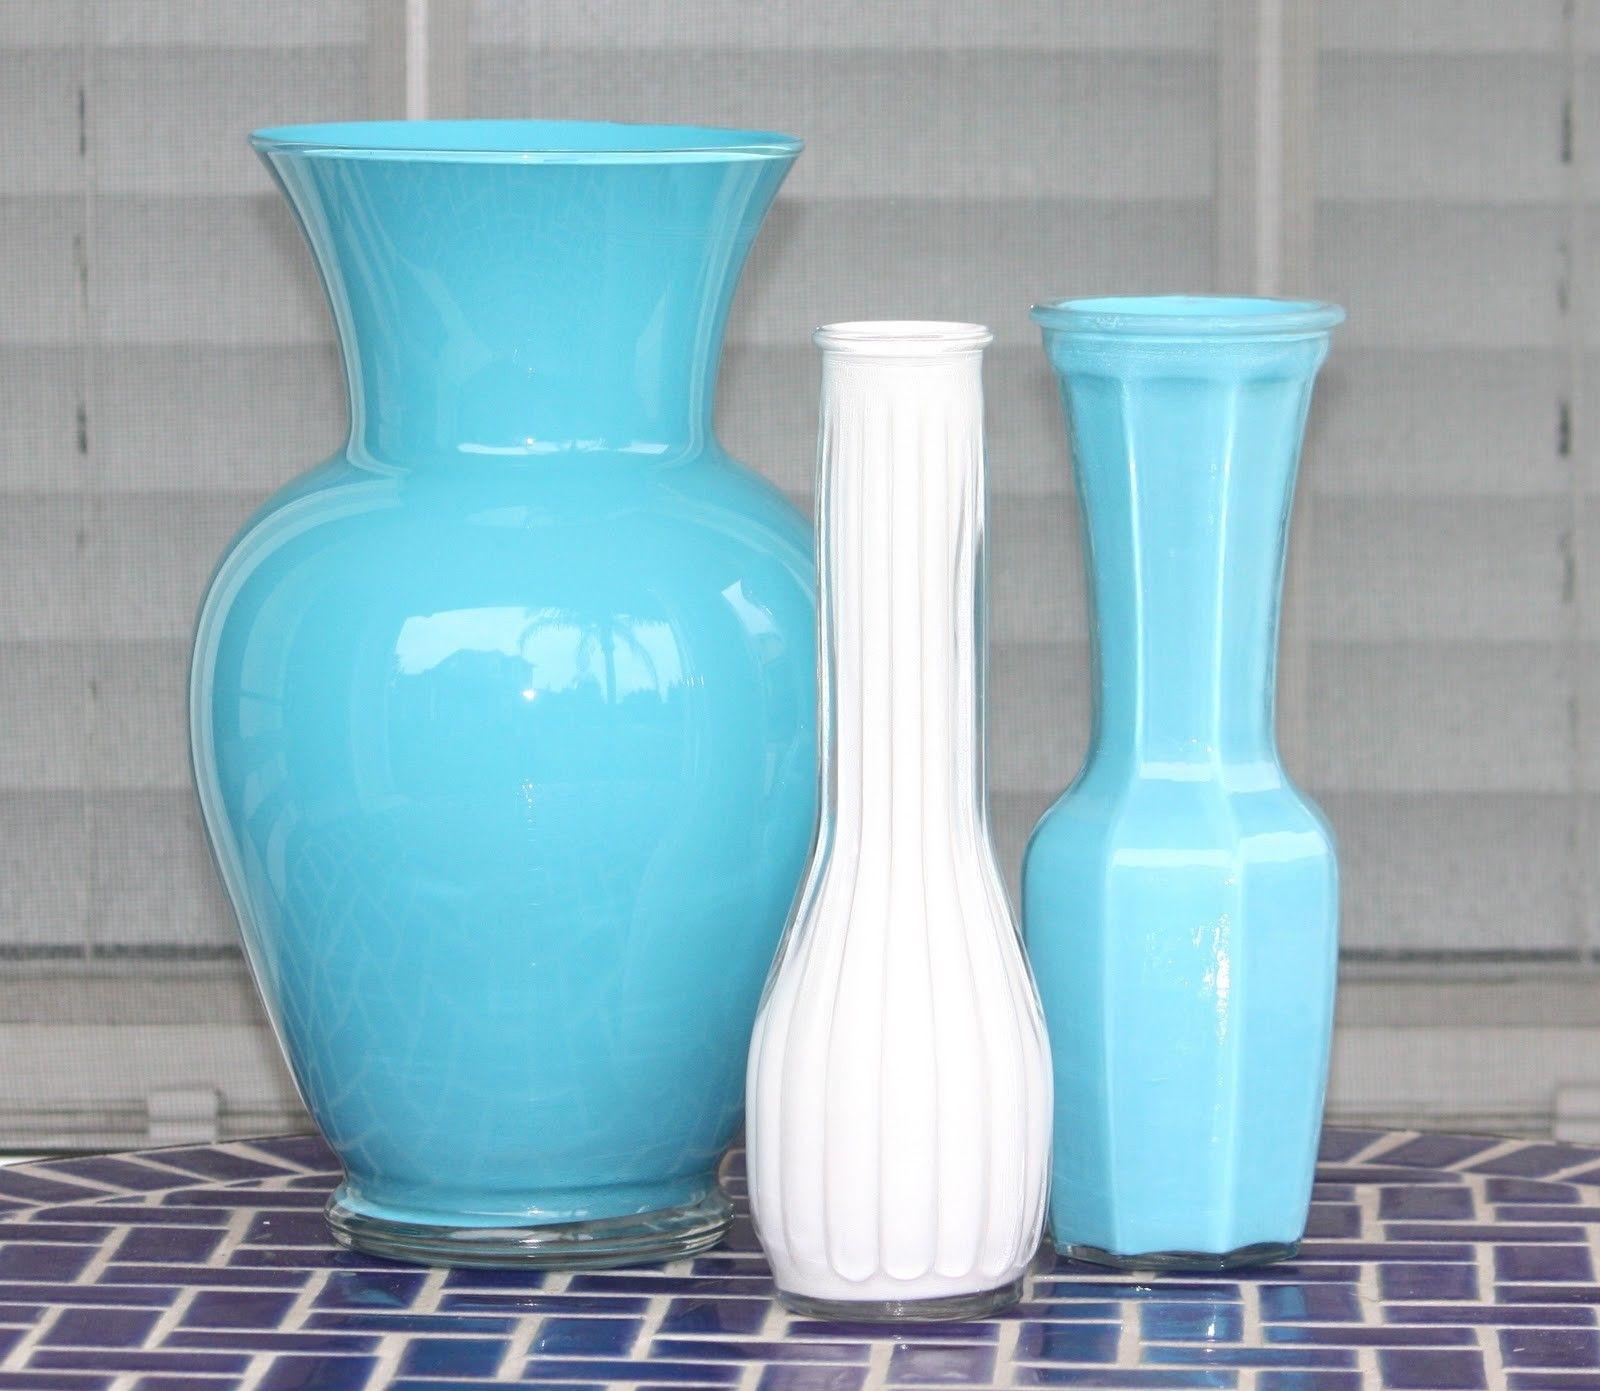 bristol glass vase of blue crystal vase new diy paint glass awesome encuentra gran regarding blue crystal vase new diy paint glass awesome encuentra gran variedad de frascos